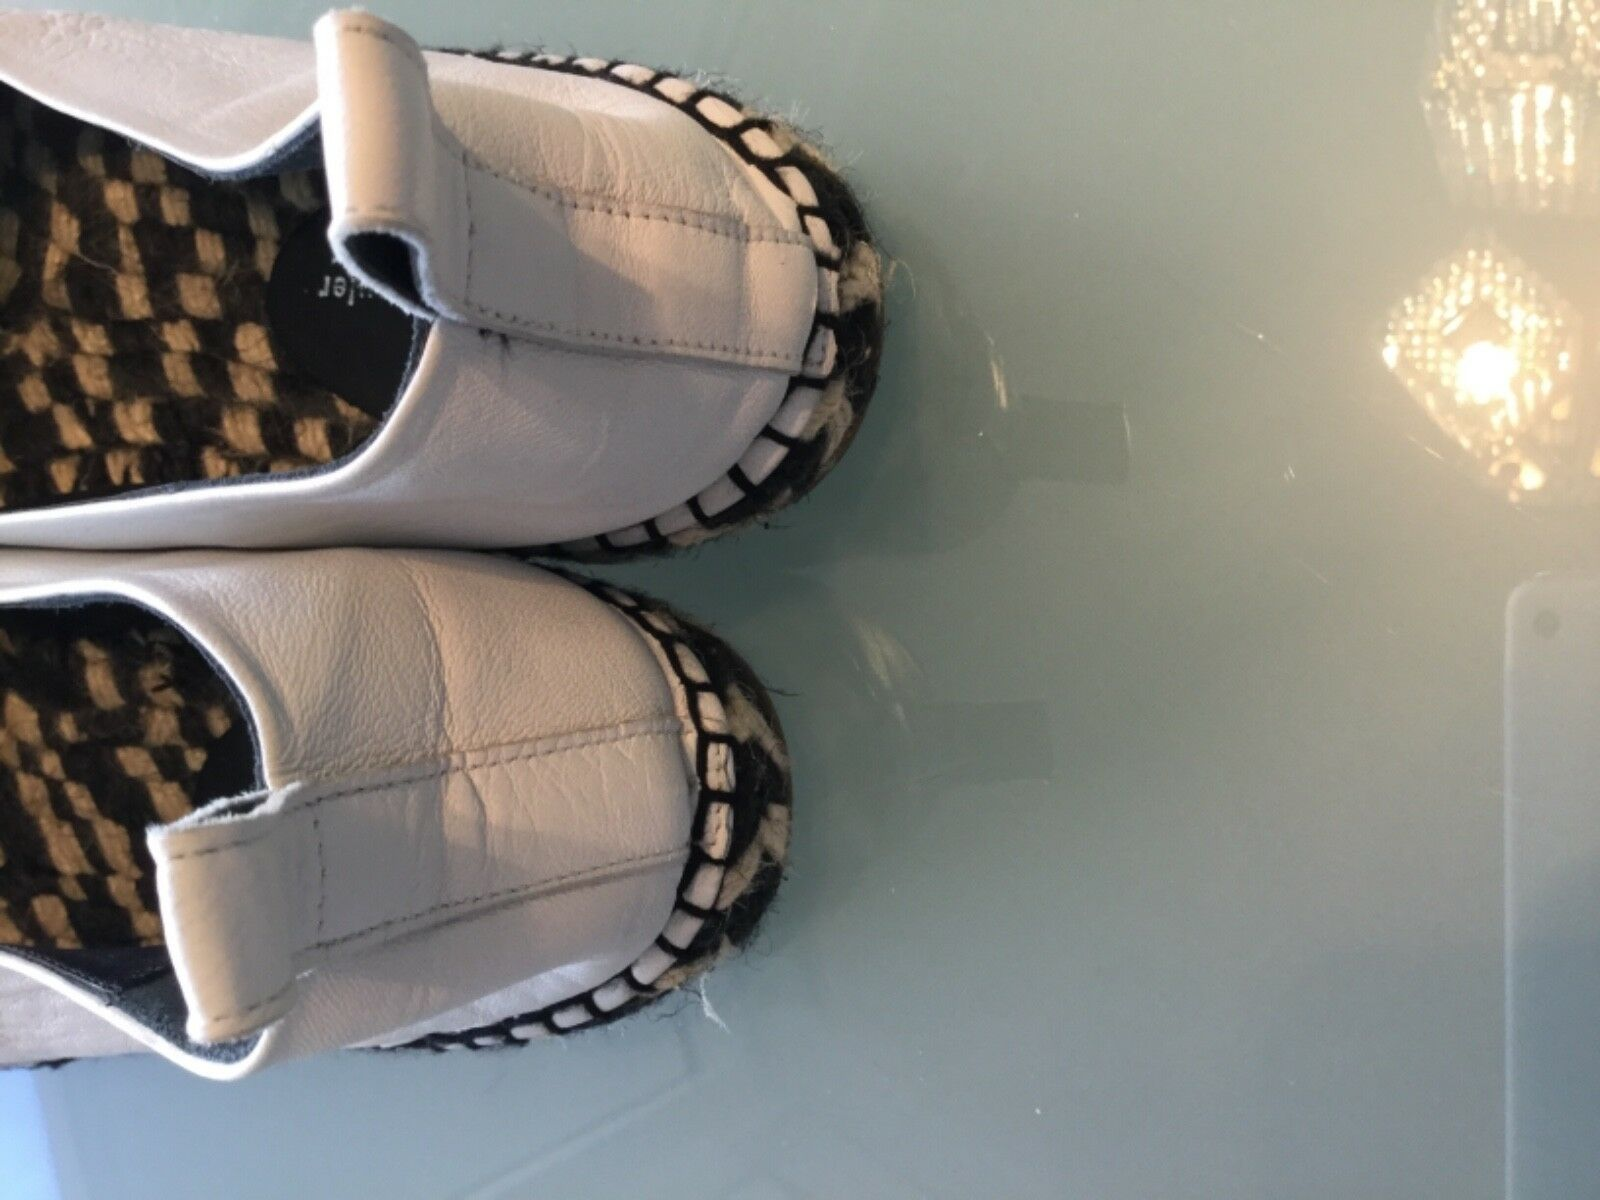 Proenza Schouler Reptile Reptile Reptile  White  Black Leather  Espadrille Women's Eur Size 40 2b513a